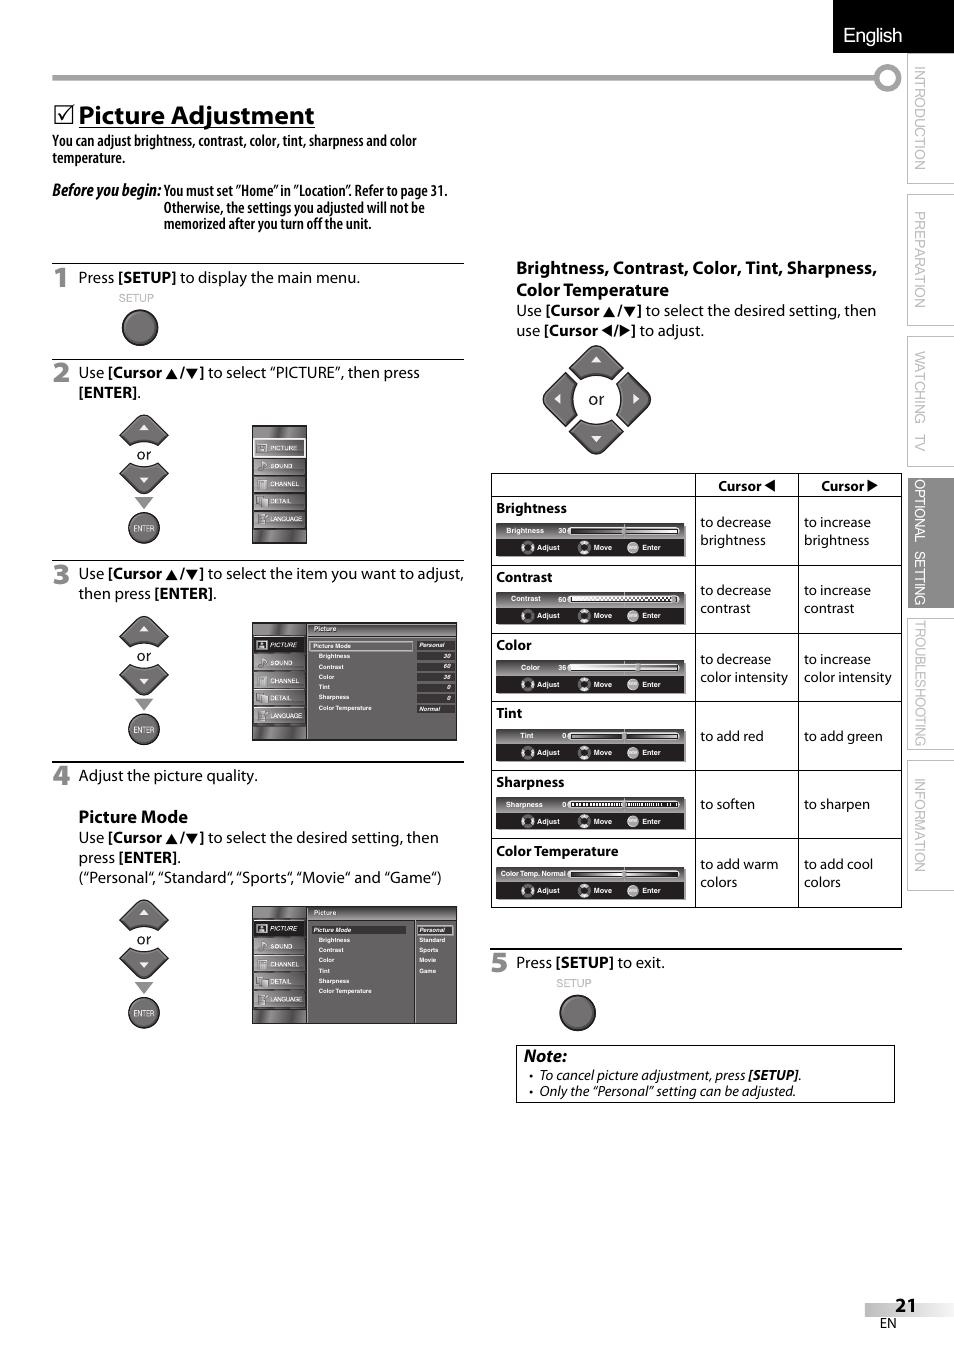 English español français, 5 picture adjustment, Before you